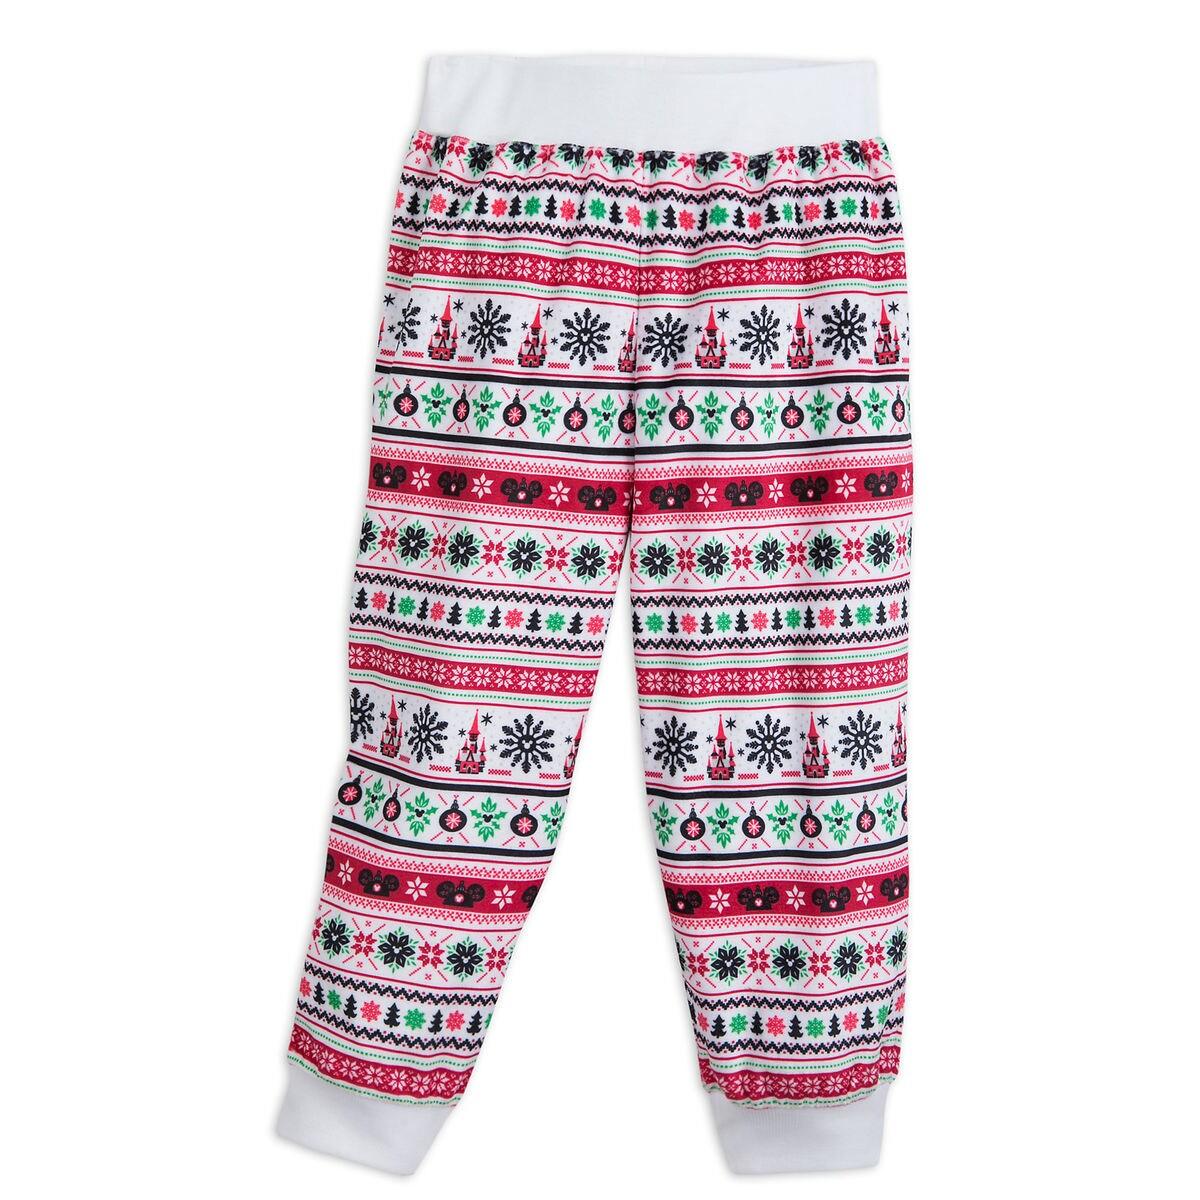 cd585f8d91 Product Image of Santa Mickey Mouse Ear Hat Fair Isle Pajama Pants for Kids  - Cream